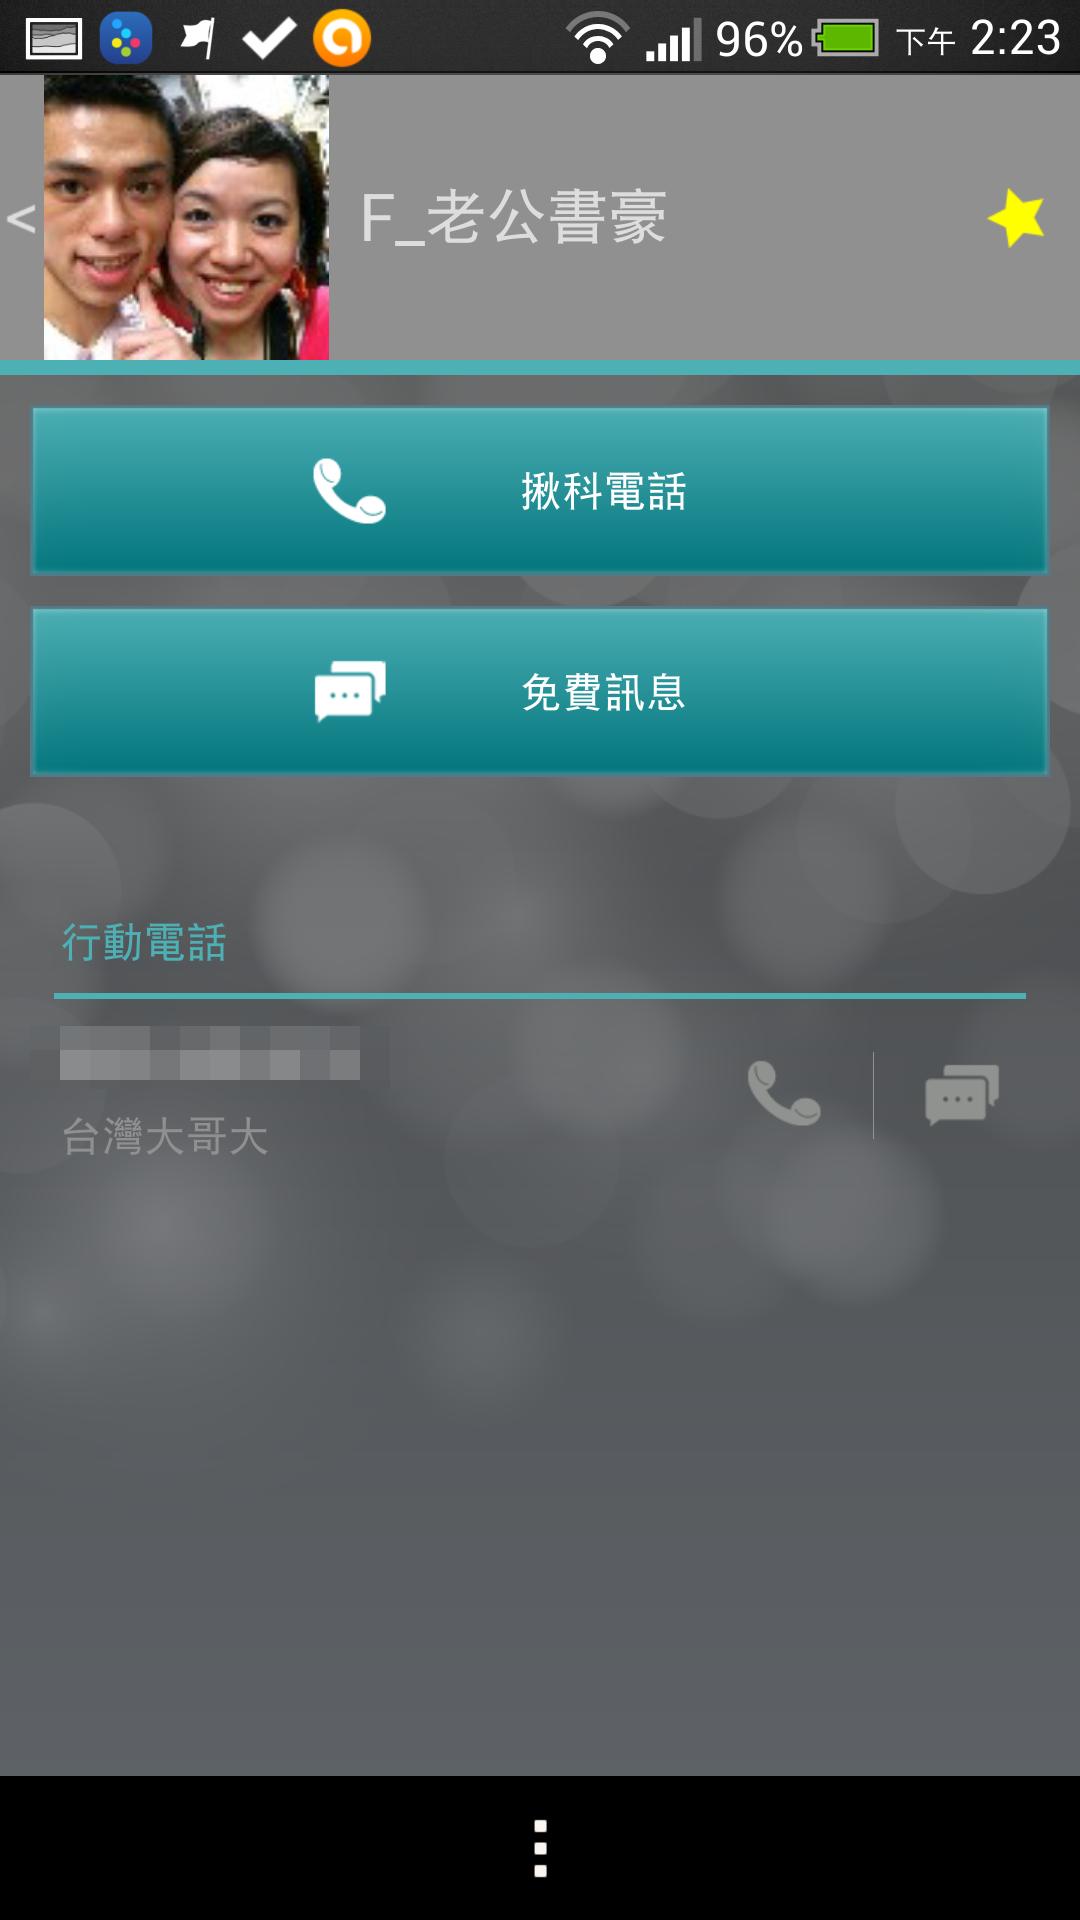 Screenshot_2013-11-29-14-23-27.png